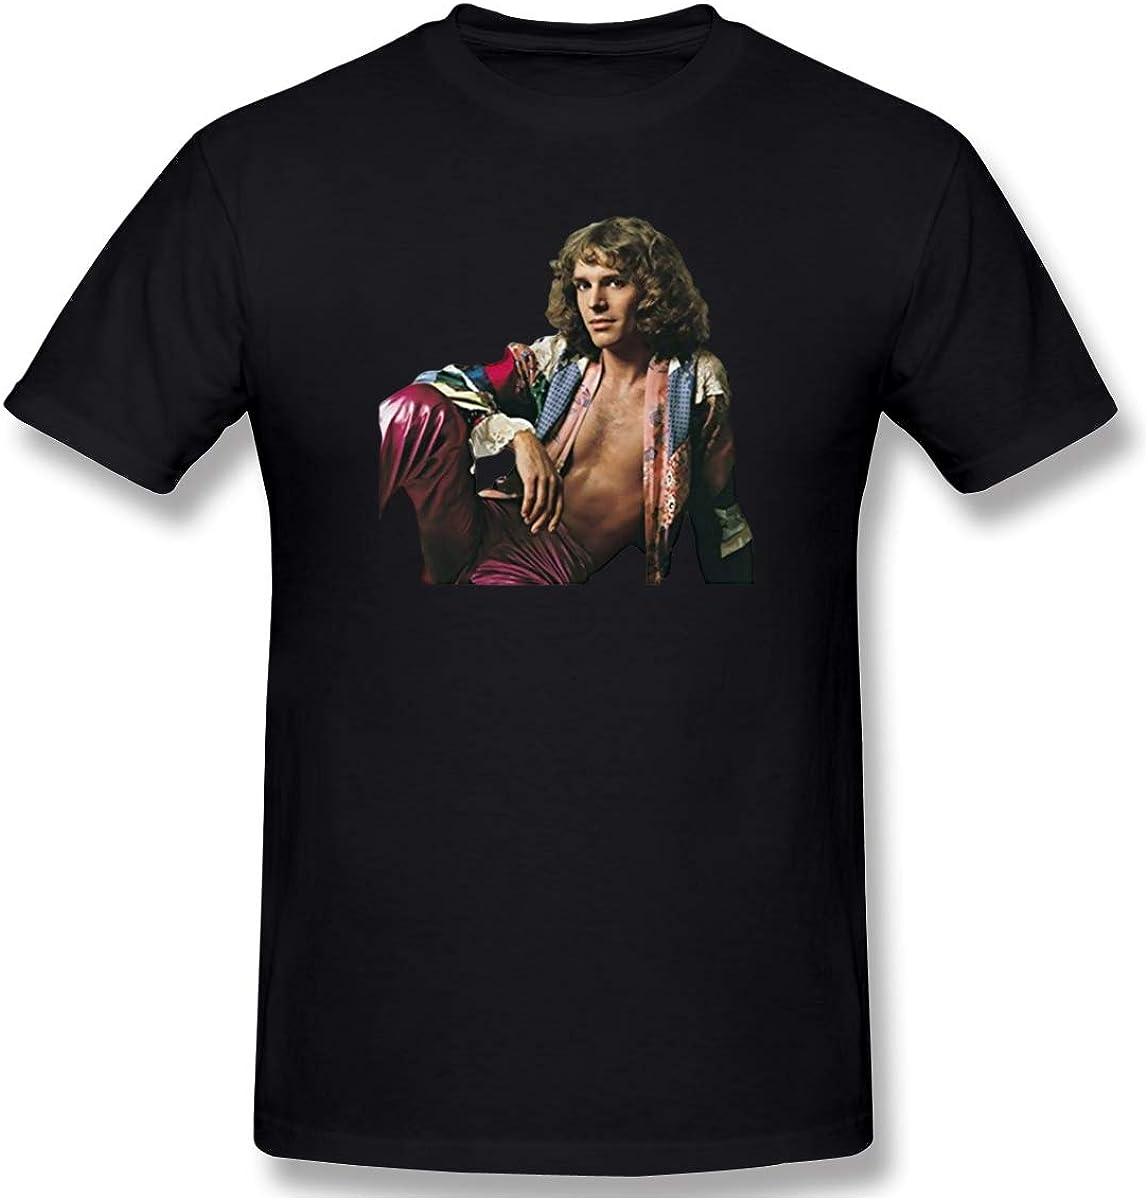 Nouveau Officiel Jesus and Mary Chain The-APRIL SKIES T-Shirt